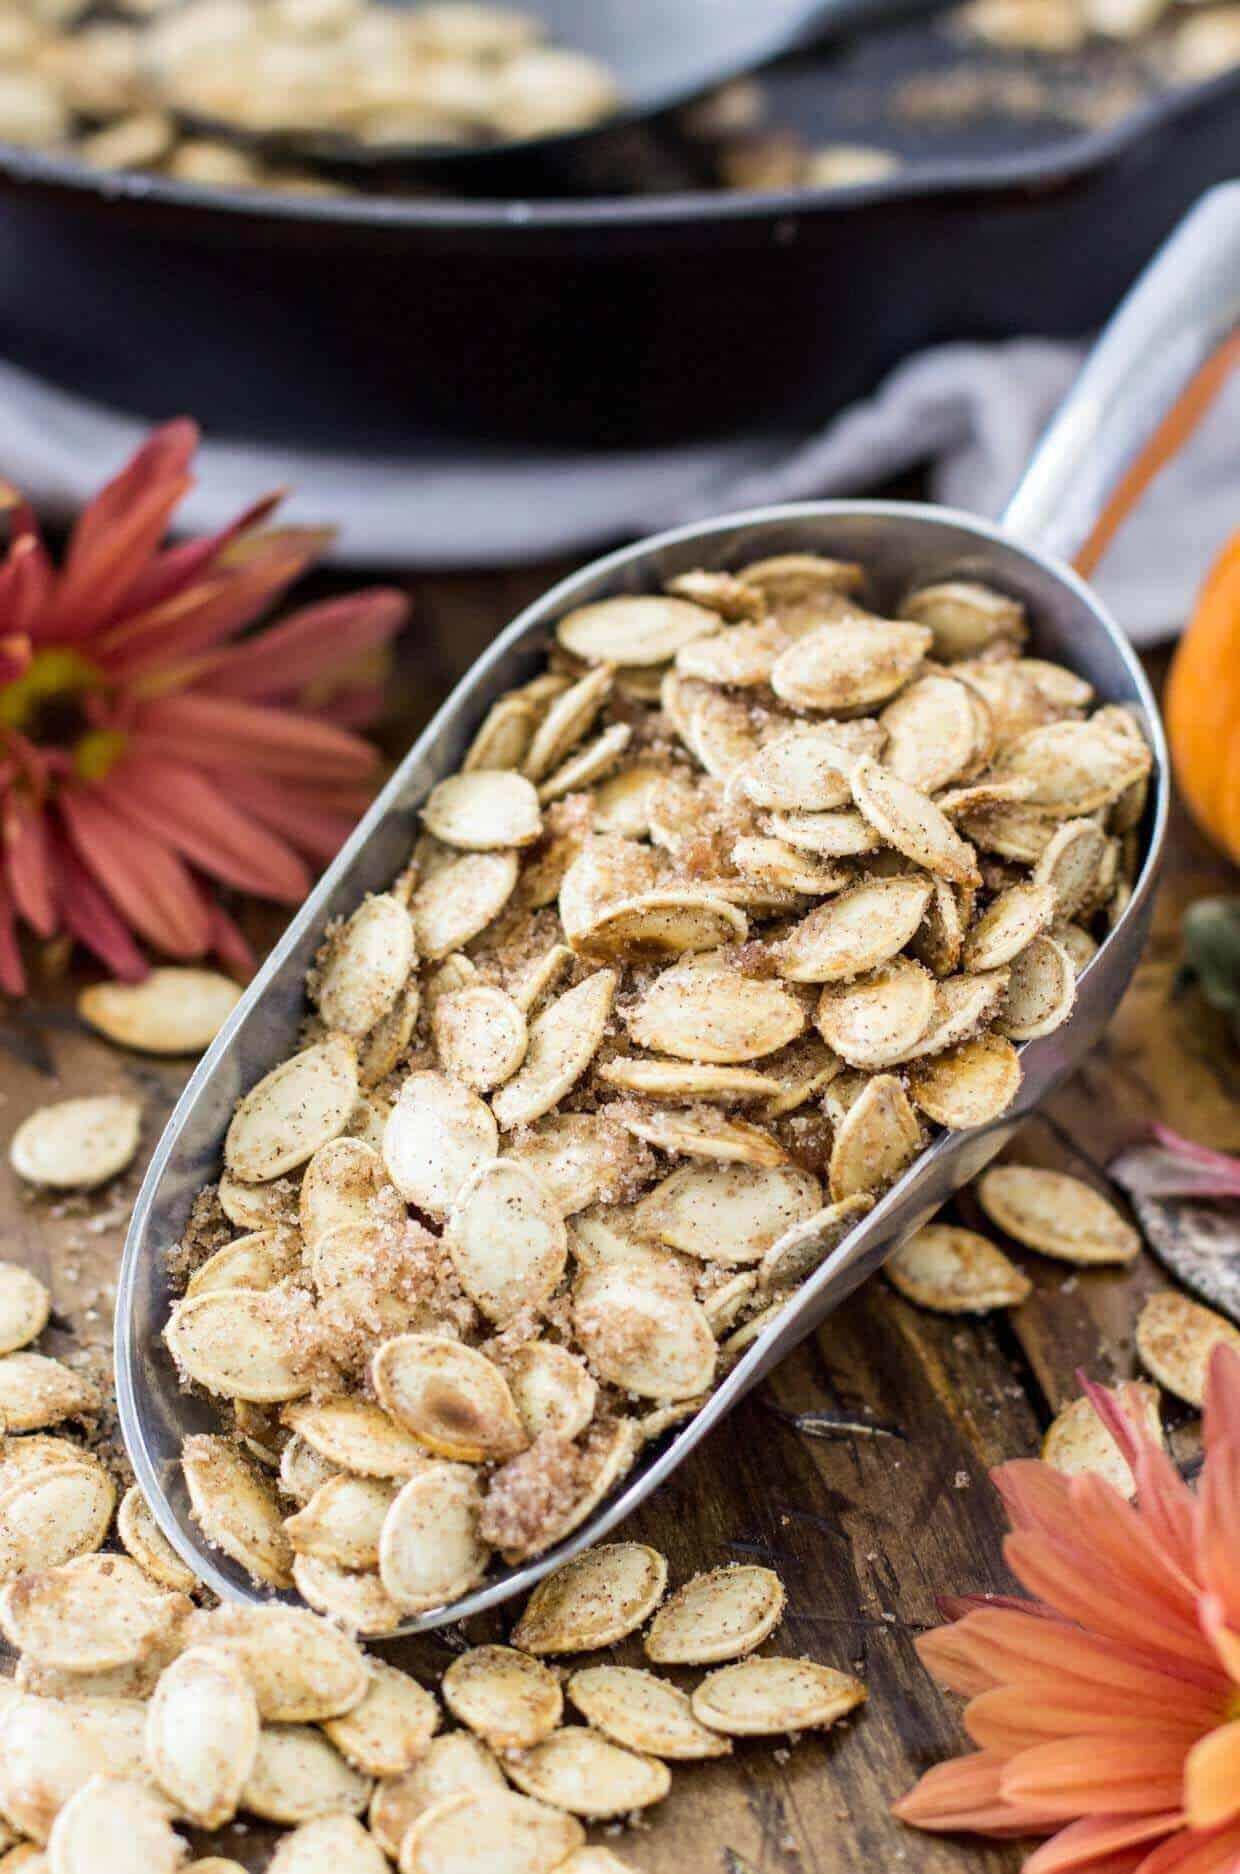 Pumpkin seeds, one of twelve top pumpkin recipes